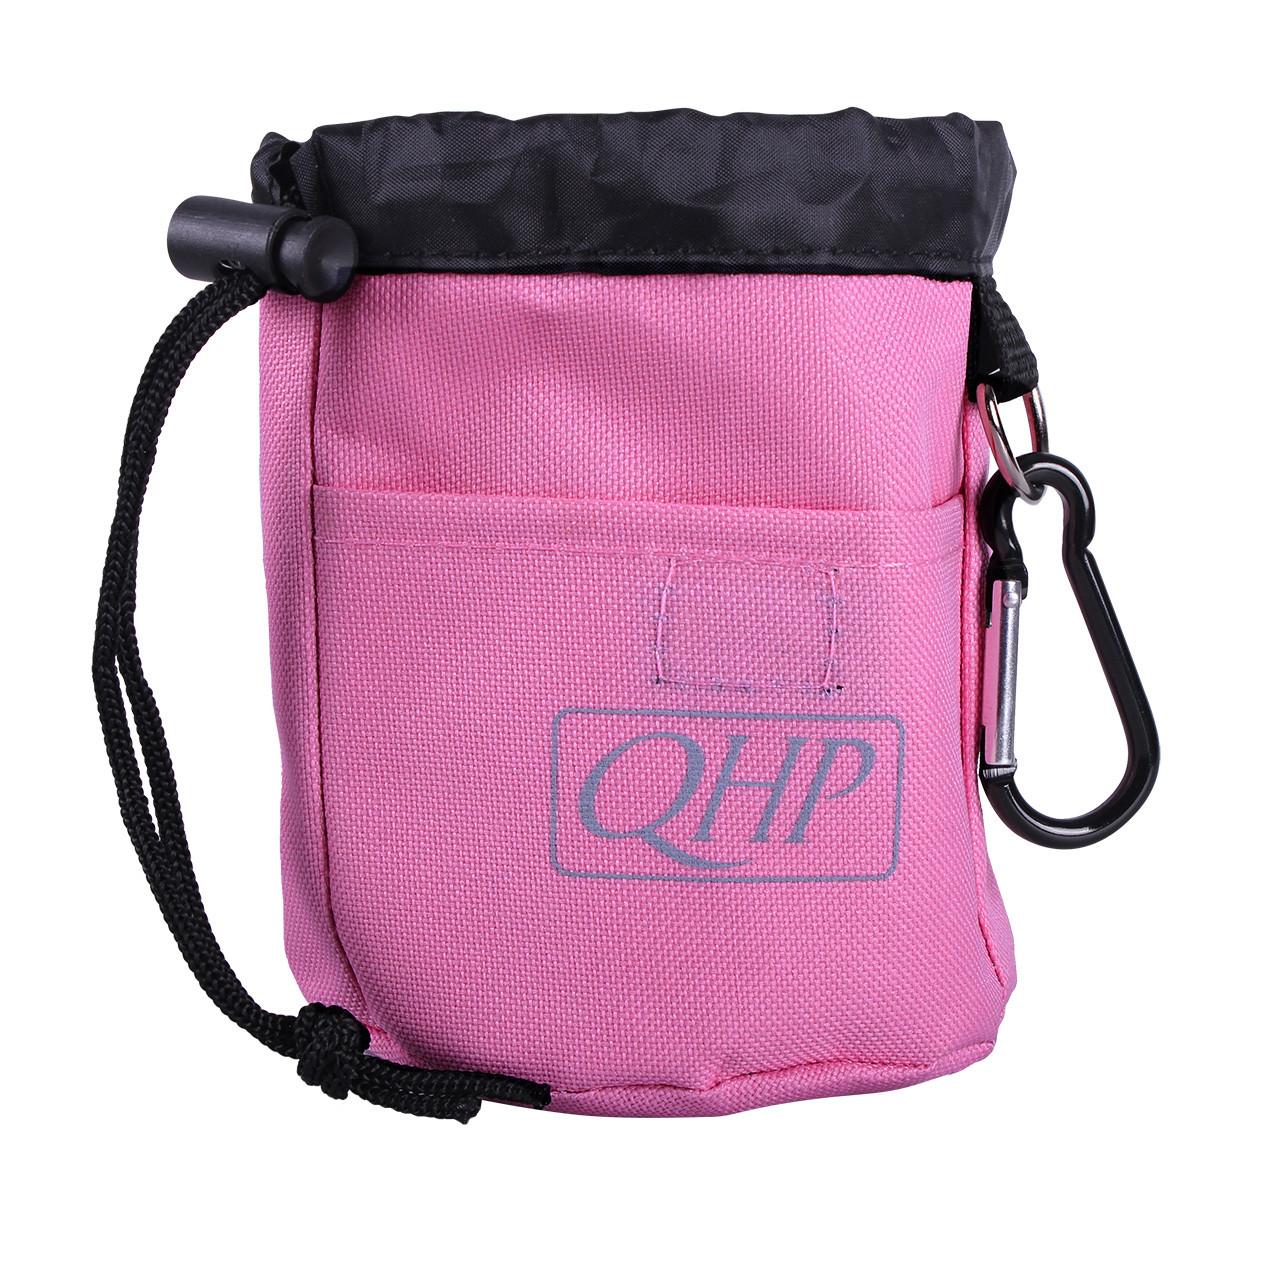 QHP Leckerlibeutel